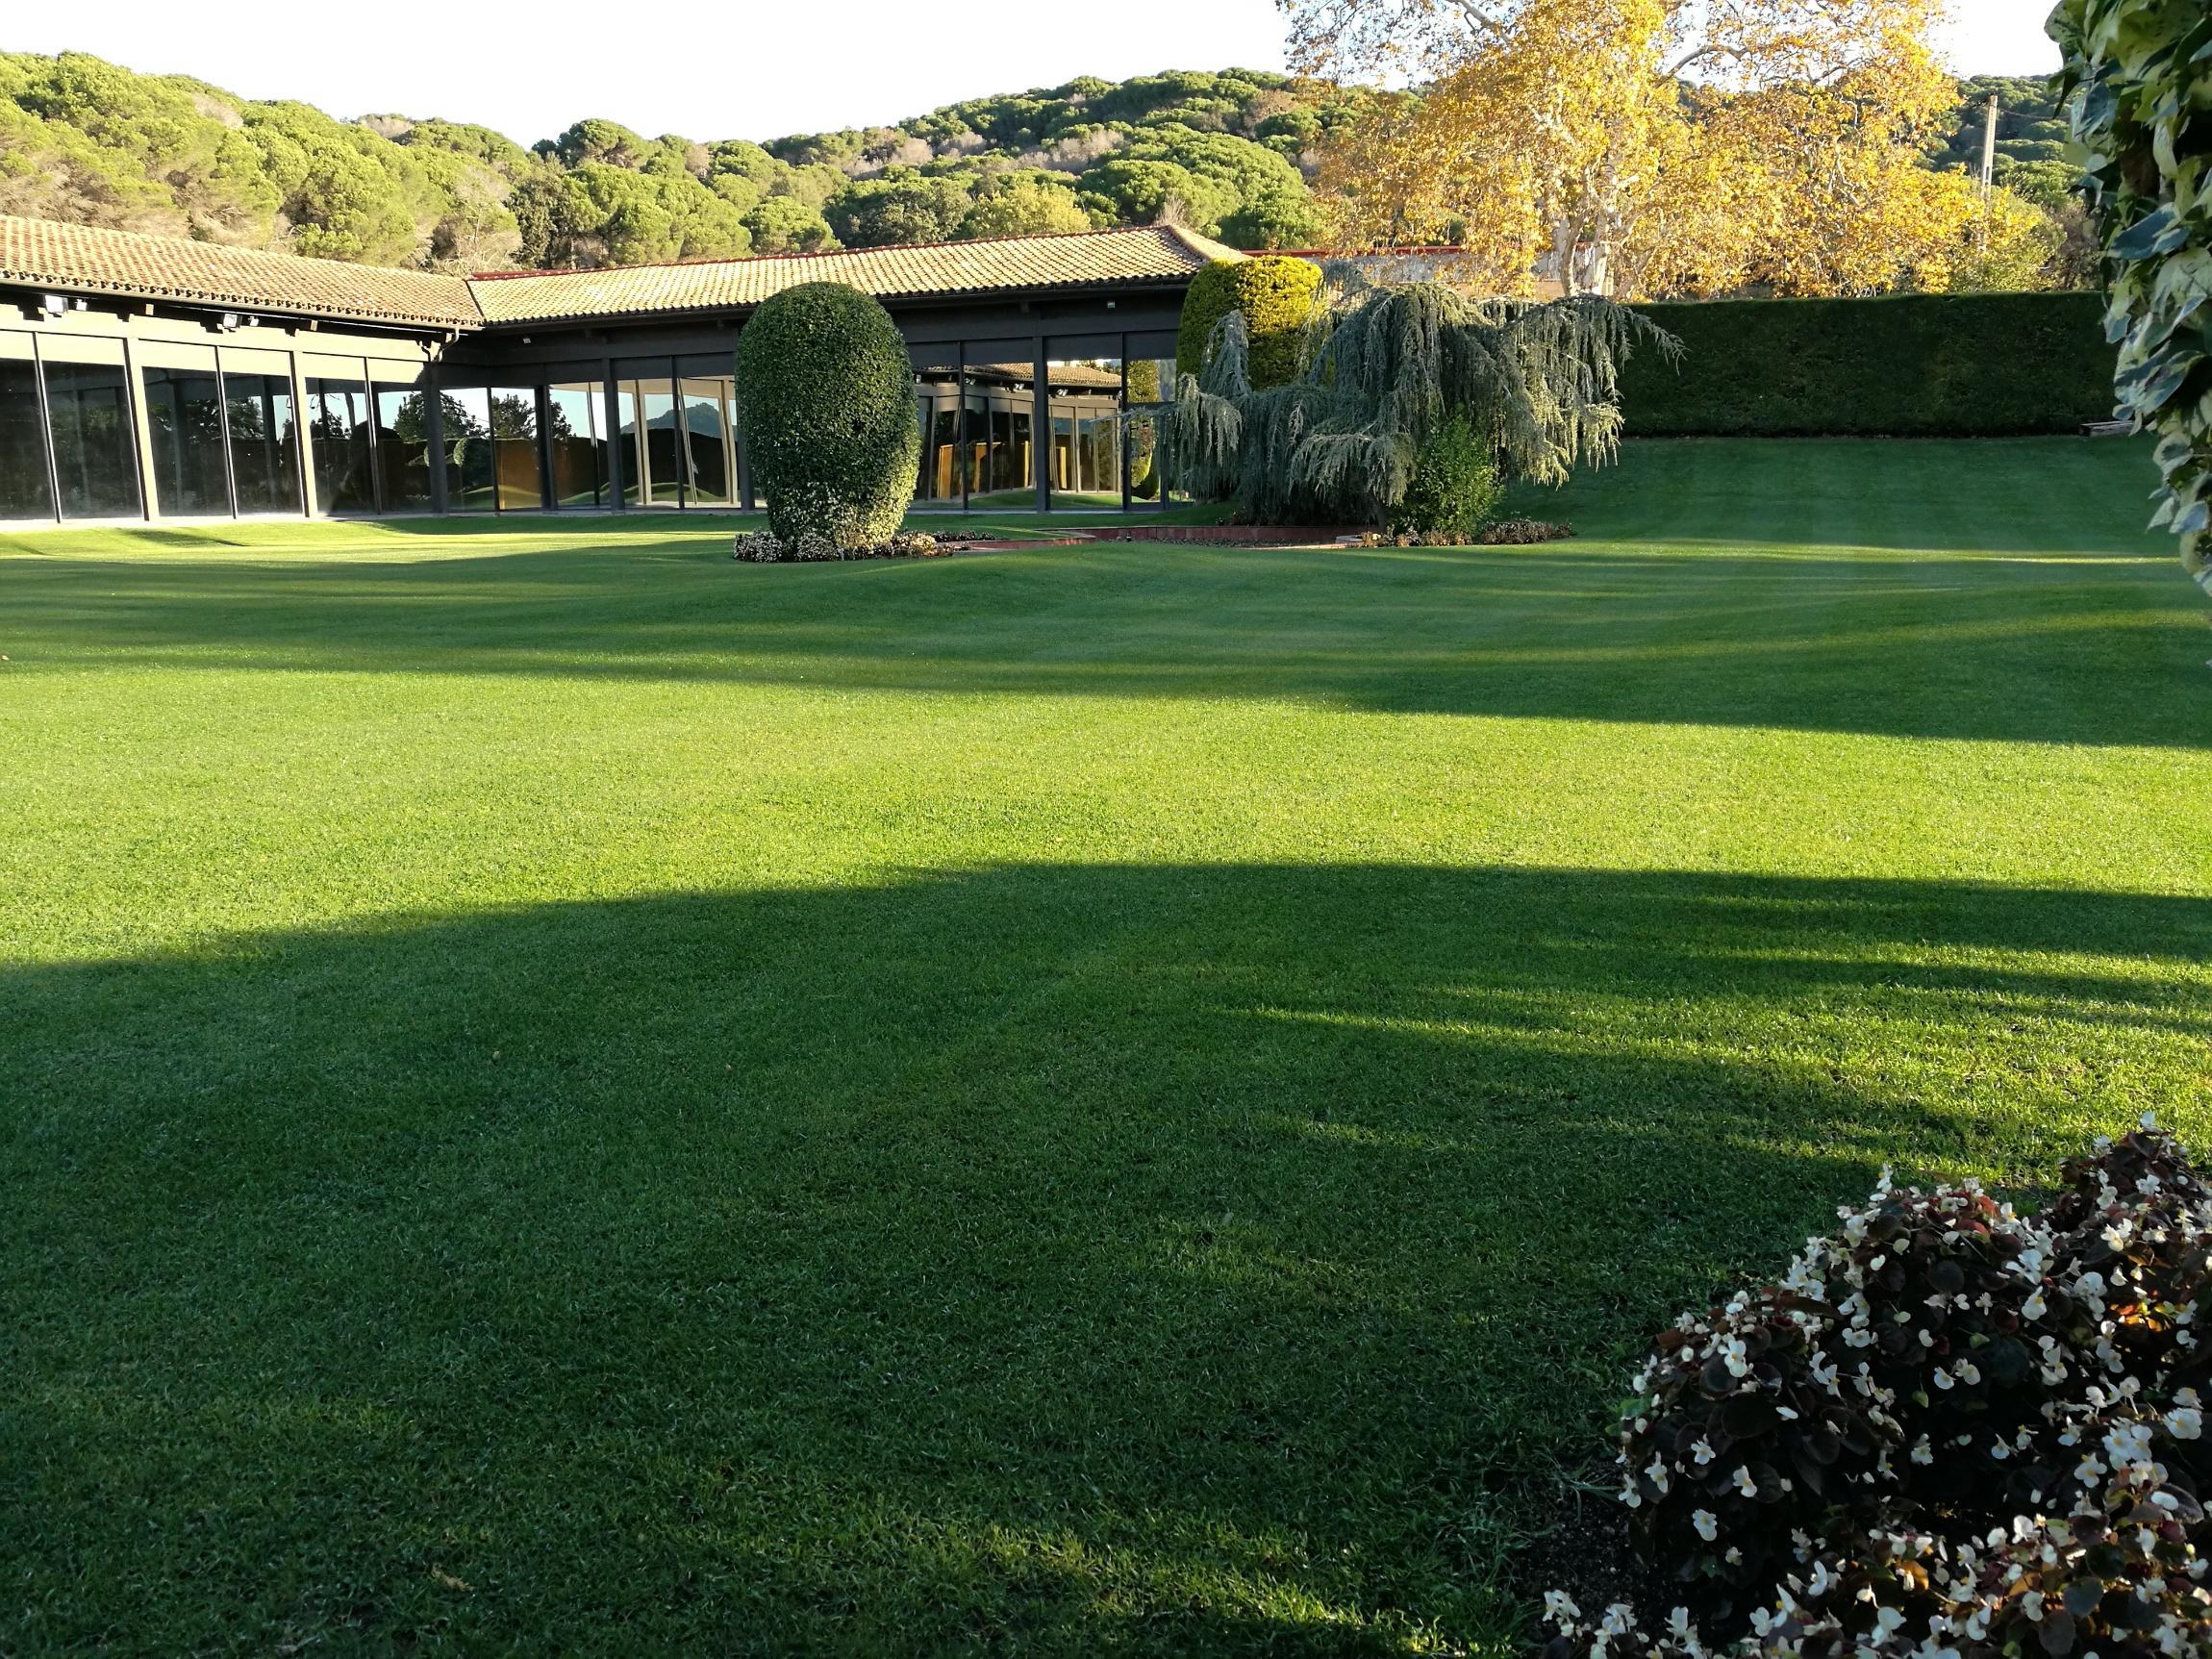 Jardiner a la font jardiner a paisajismo jardineros for Jardineria barcelona